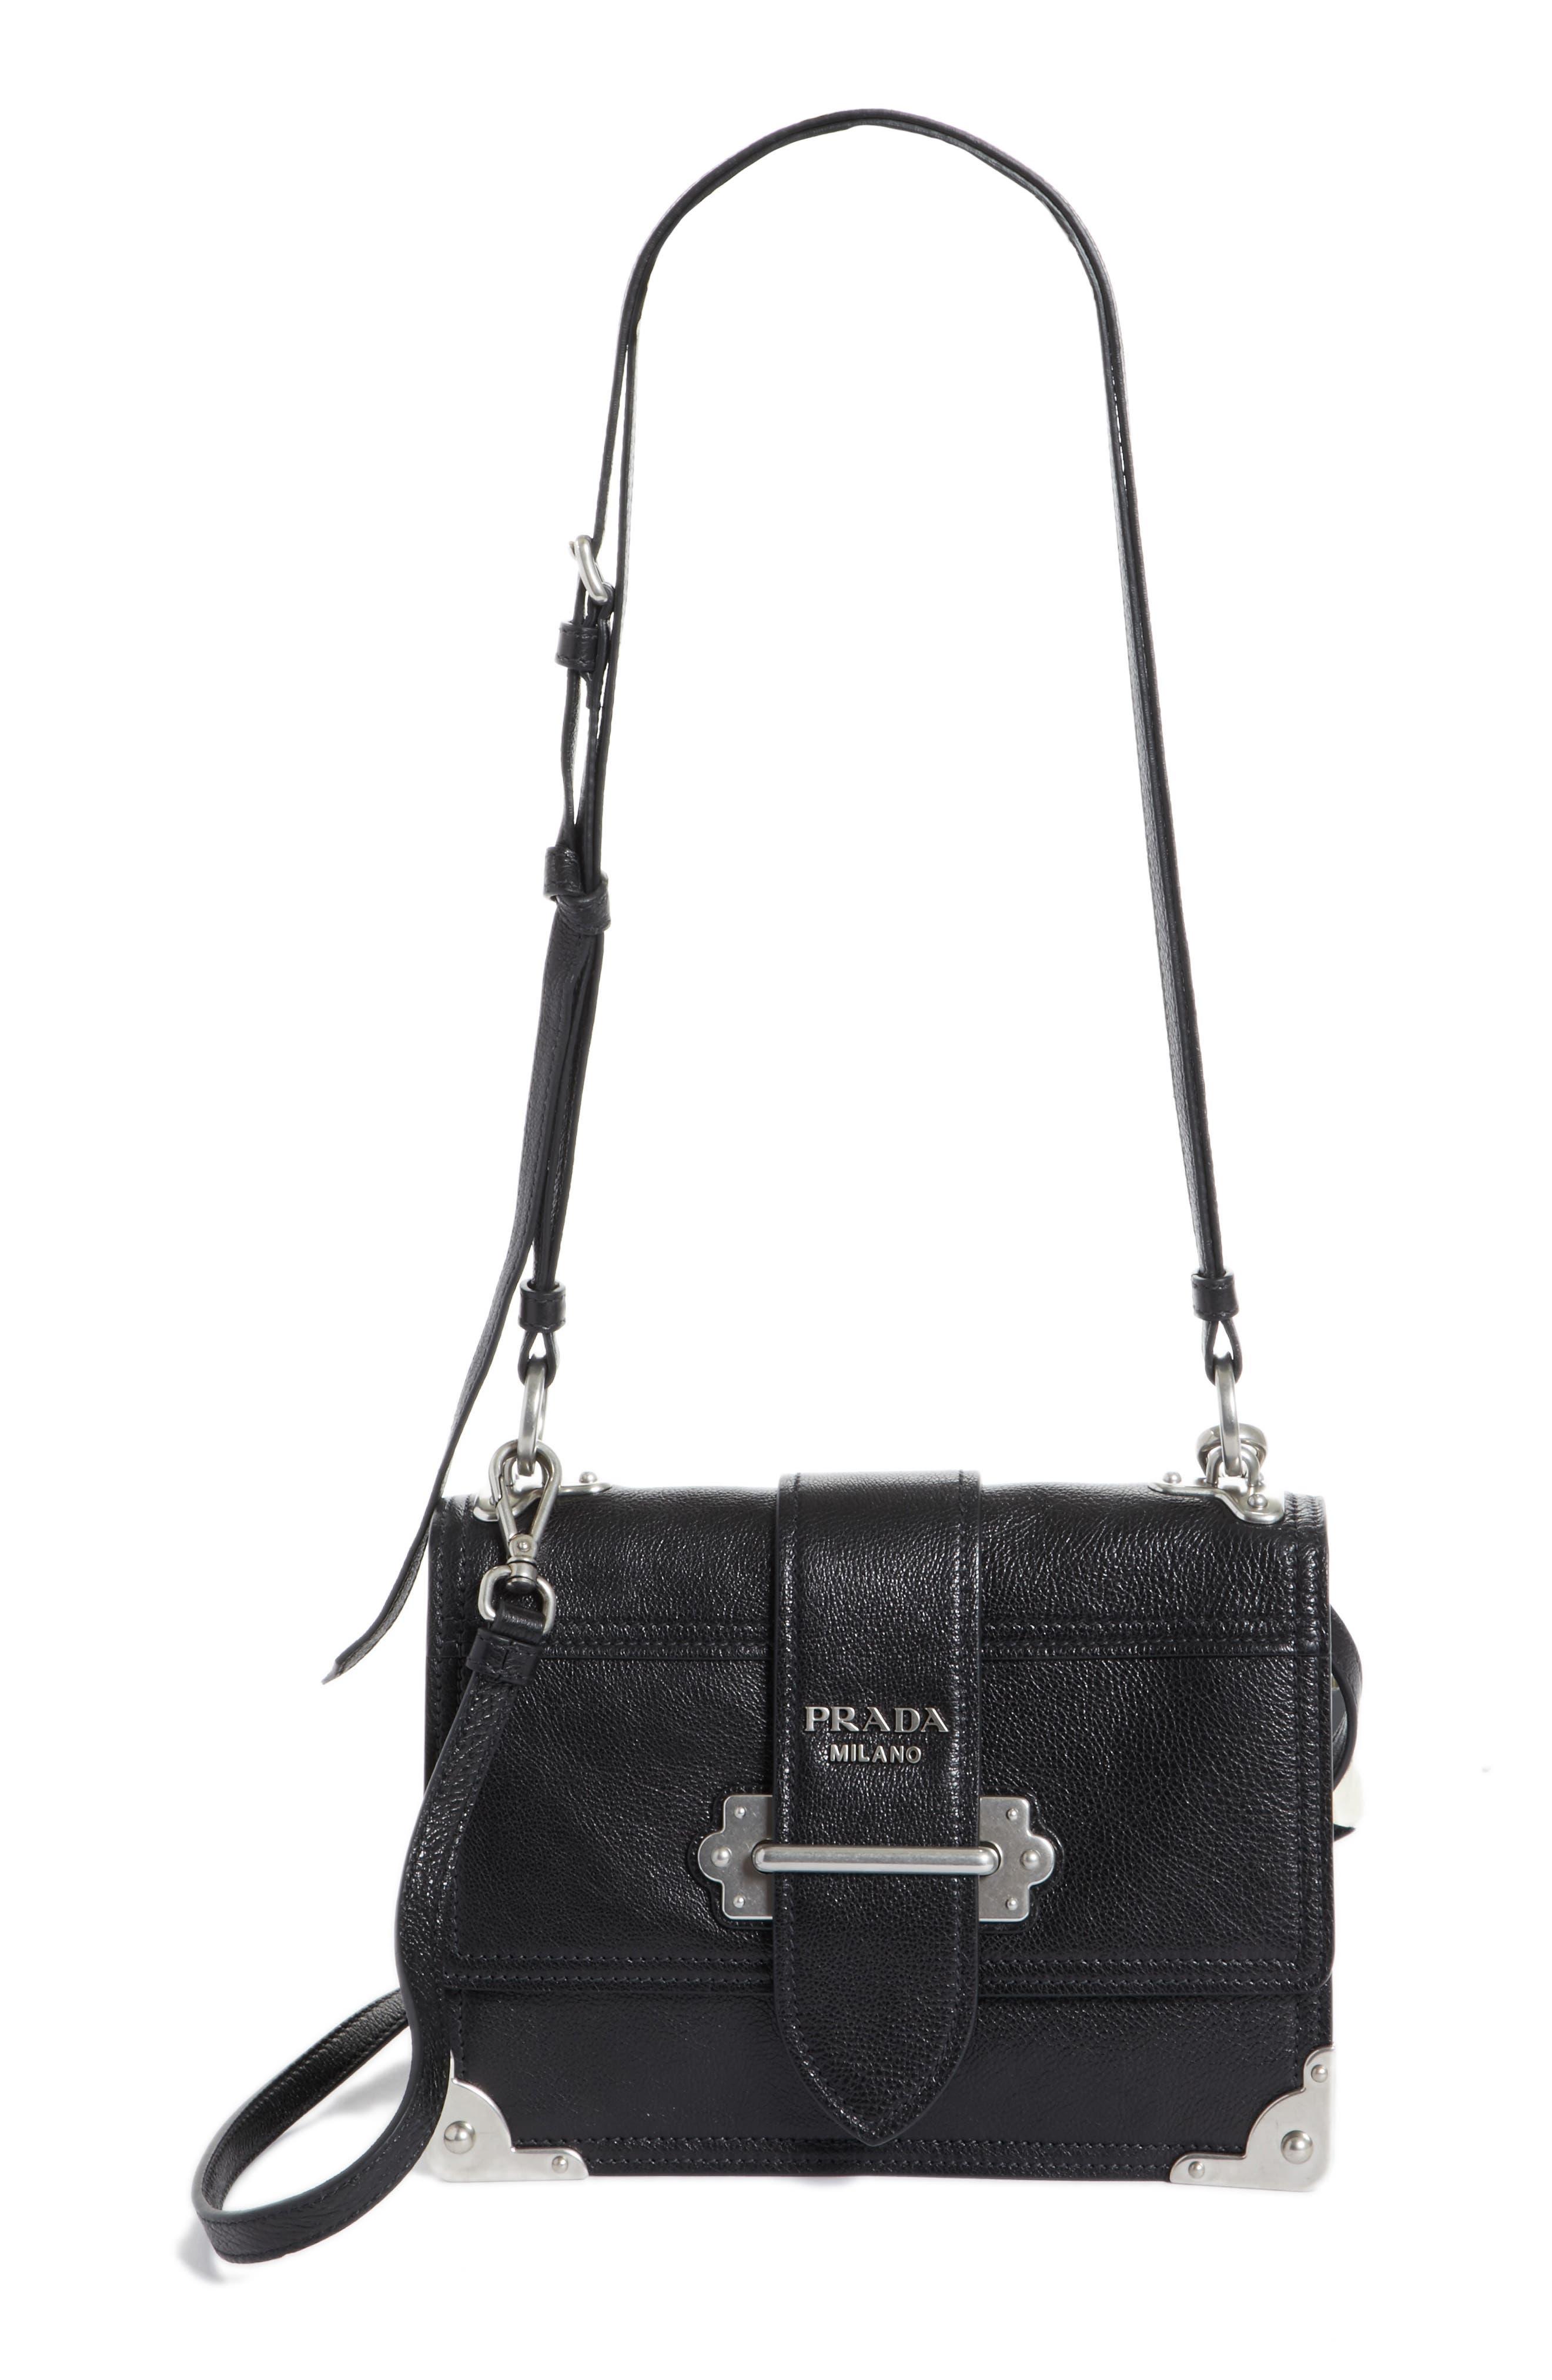 Main Image - Prada Cahier Glace Calfskin Convertible Shoulder Bag